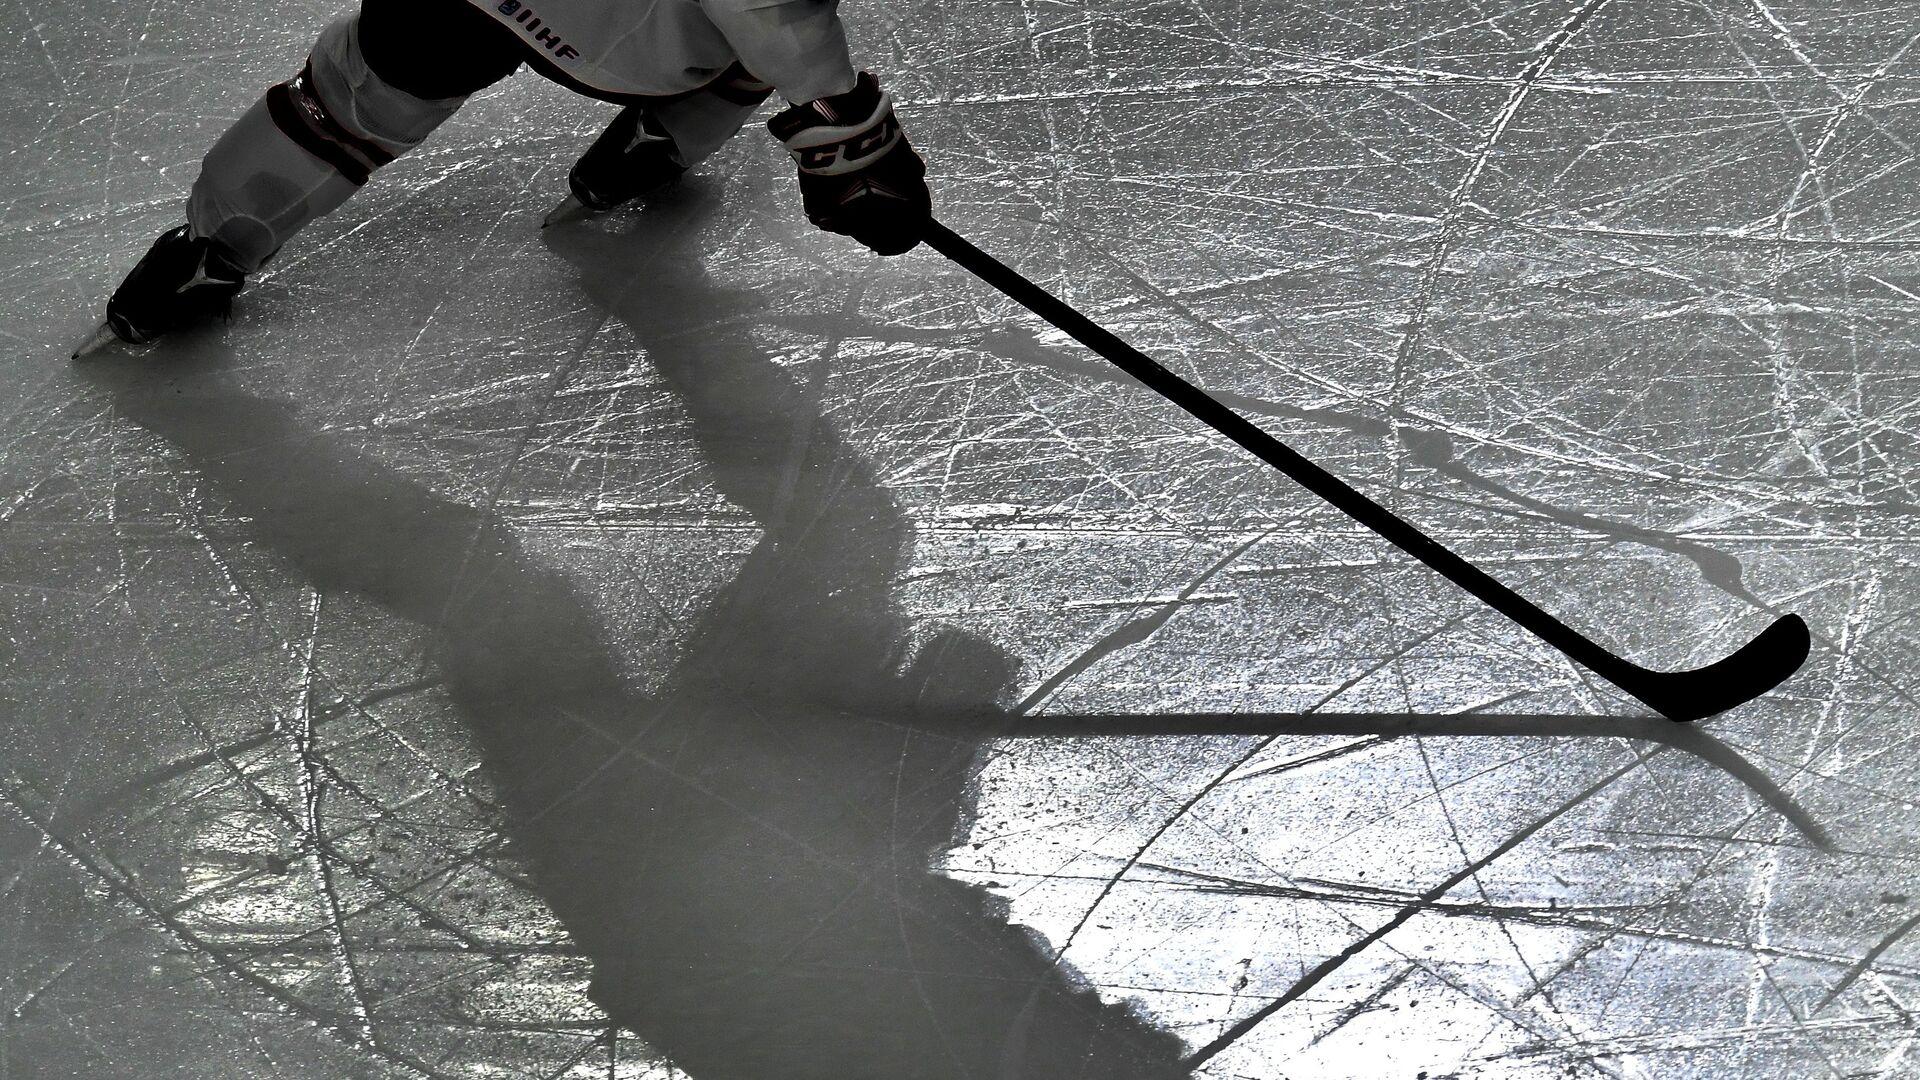 Хоккеист во время матча - РИА Новости, 1920, 13.06.2021